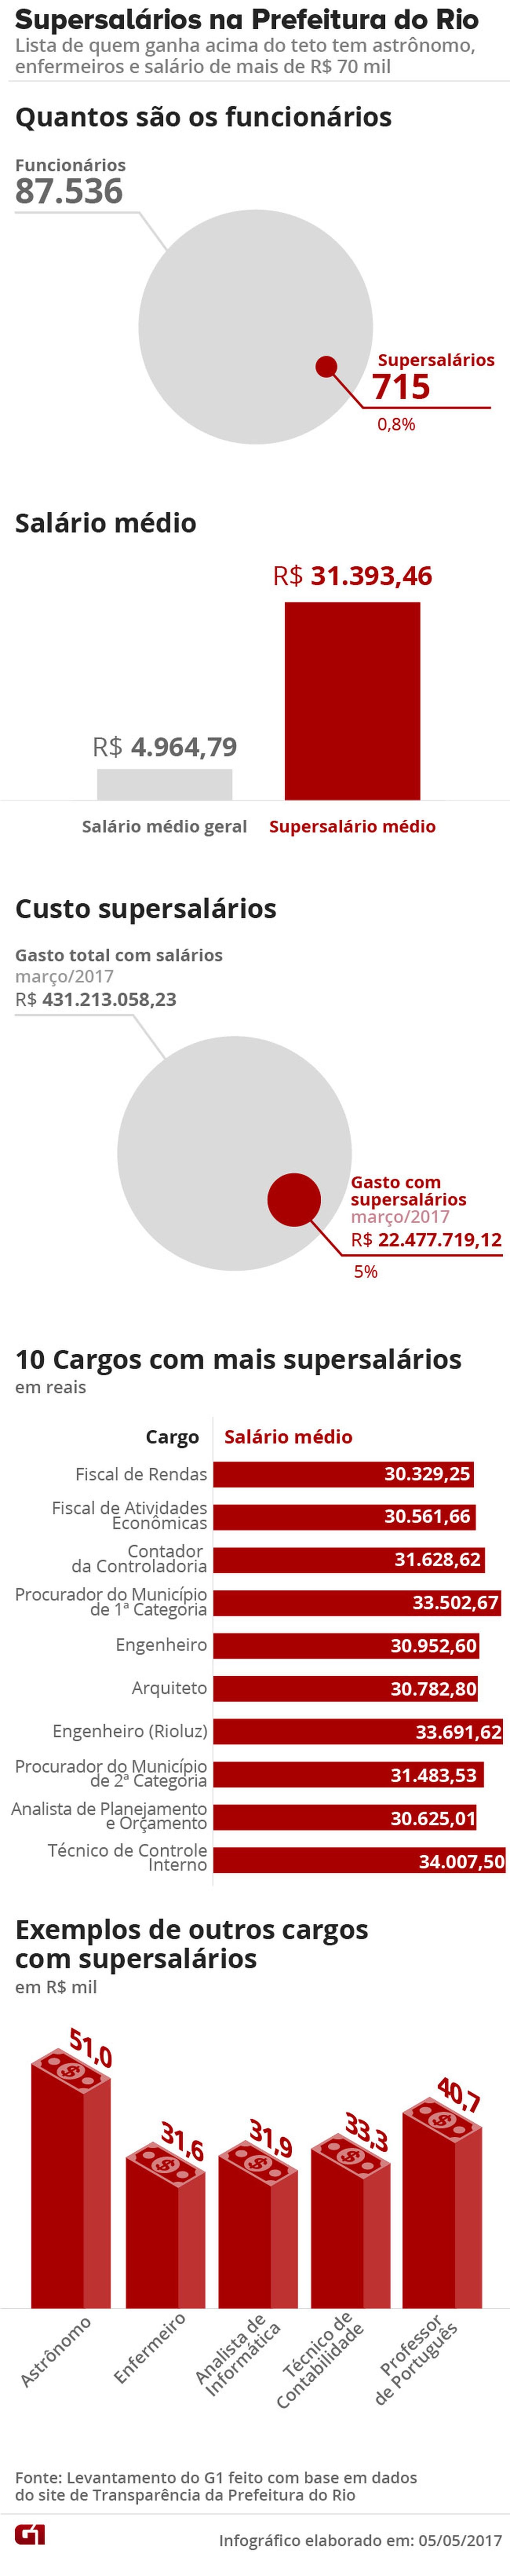 supersalarios-v3